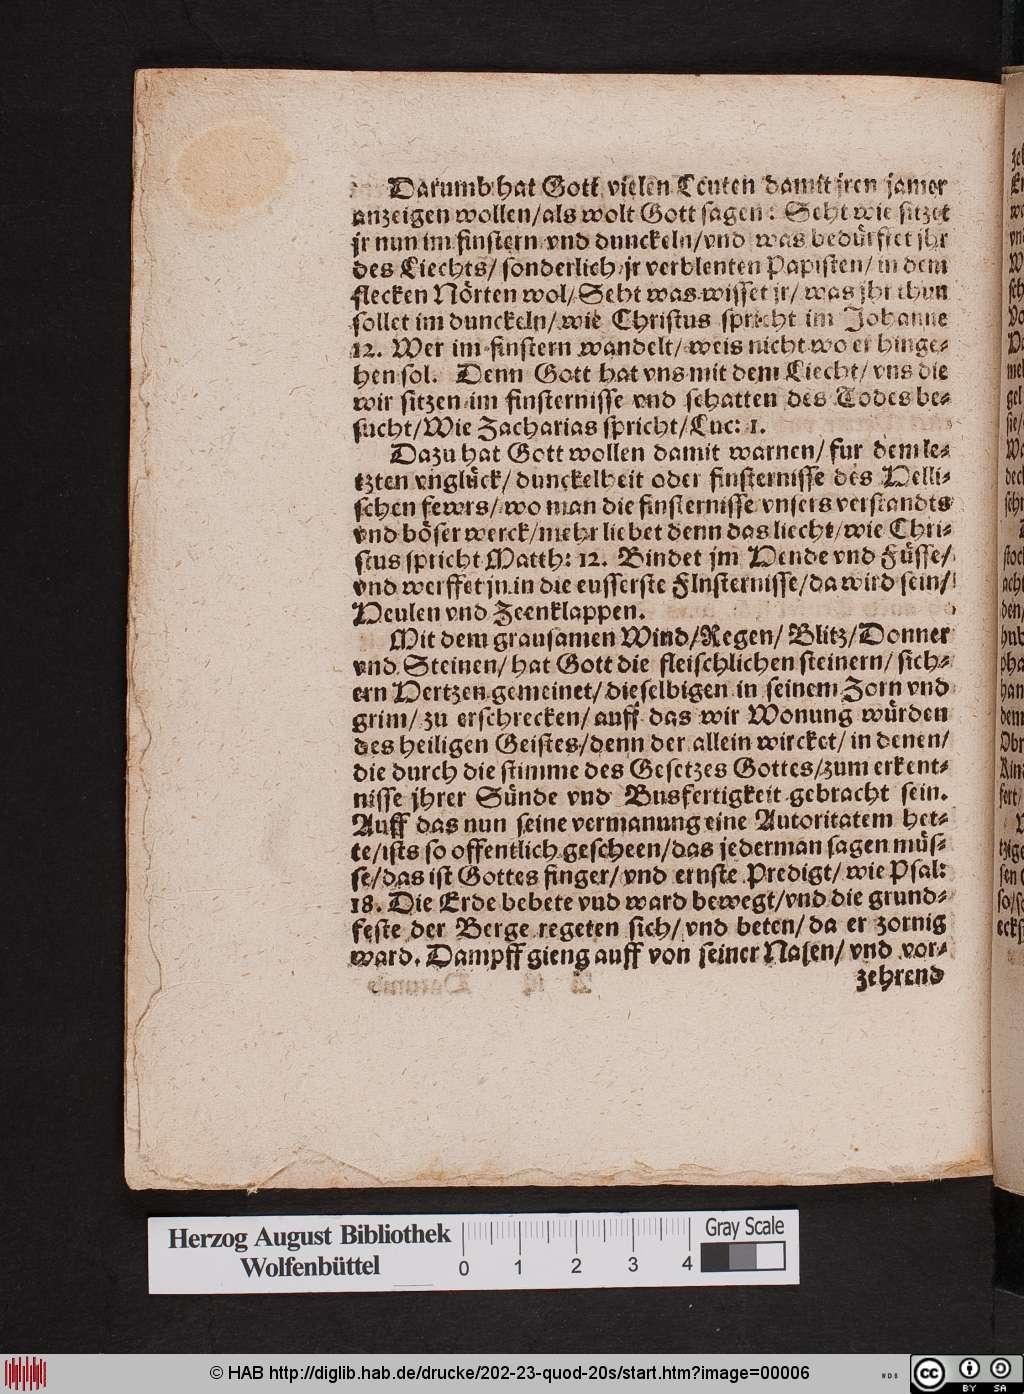 http://diglib.hab.de/drucke/202-23-quod-20s/00006.jpg